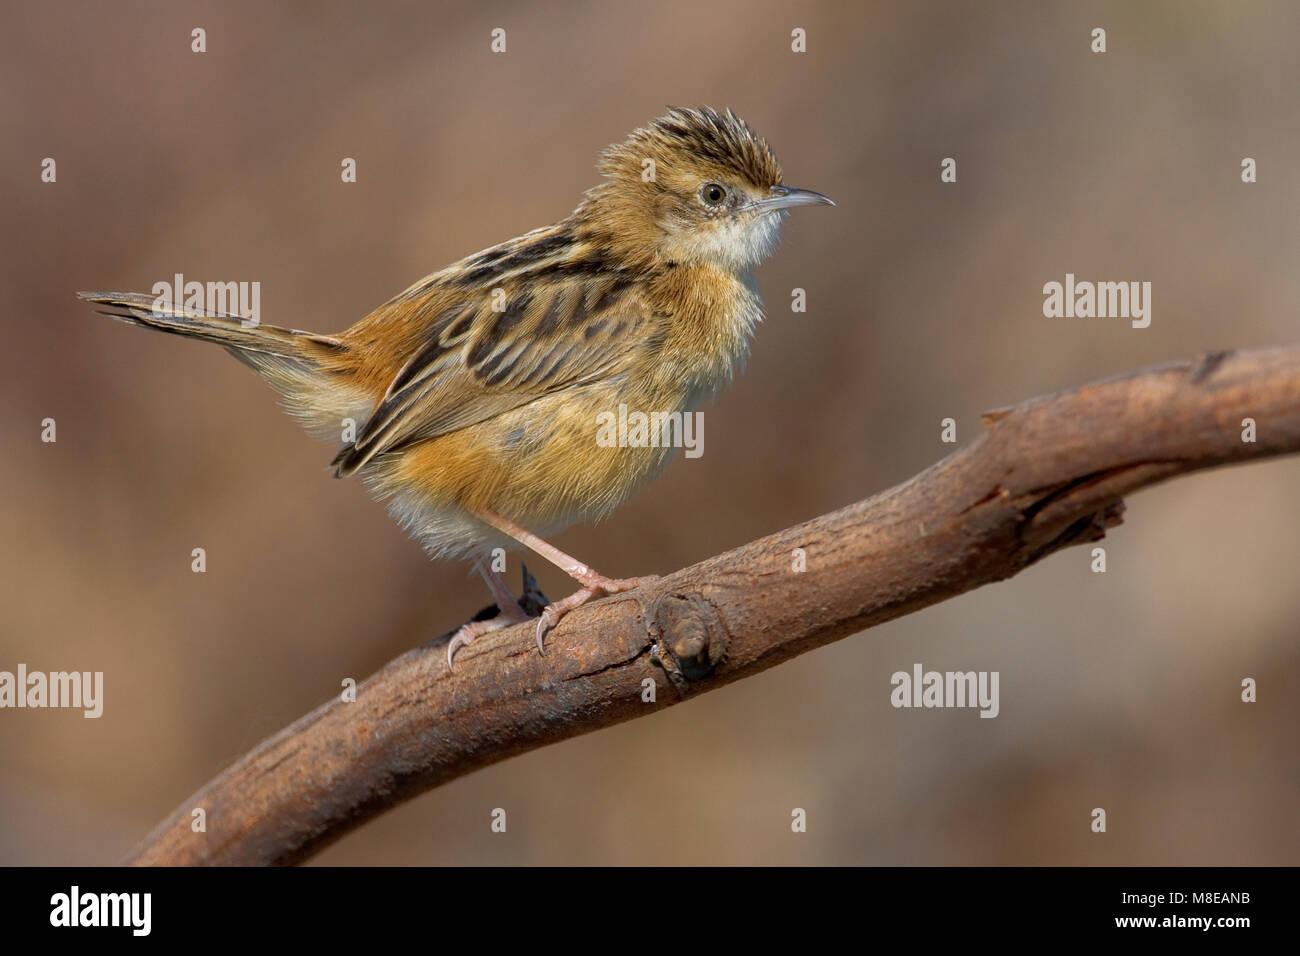 Graszanger op takje; Zitting Cisticola perched on twig - Stock Image